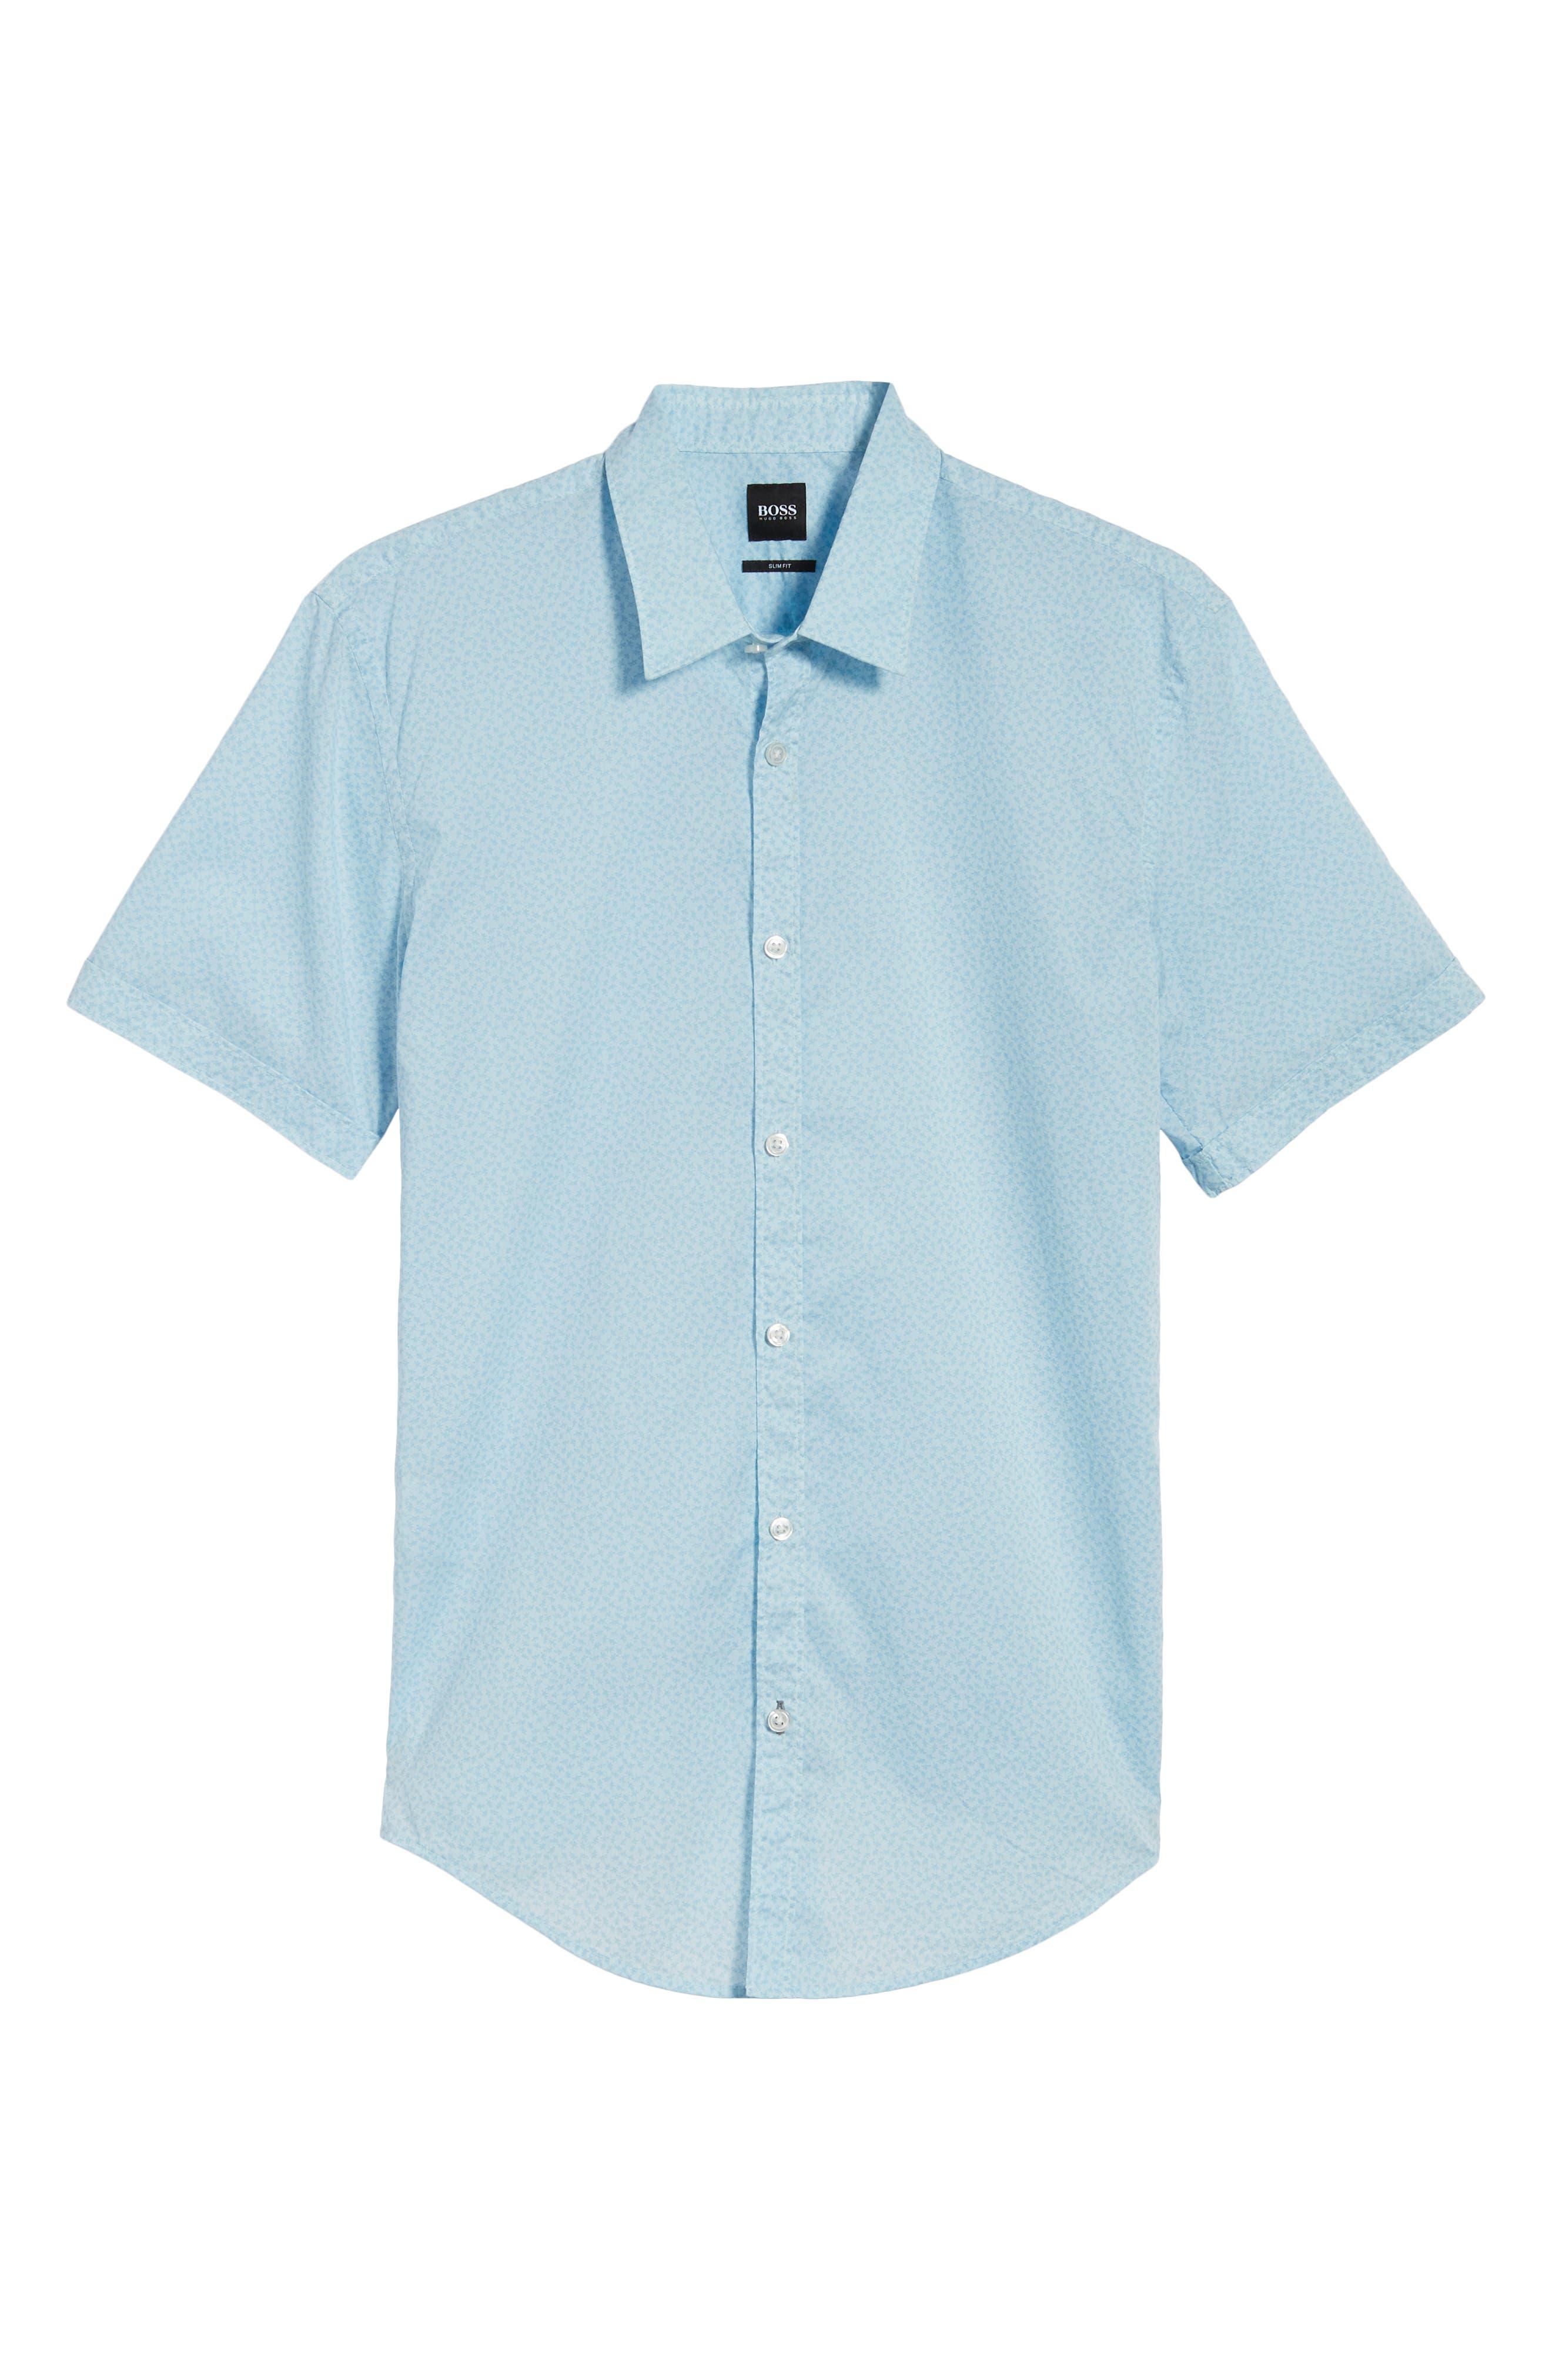 Ronn Slim Fit Flower Print Sport Shirt,                             Alternate thumbnail 6, color,                             Blue